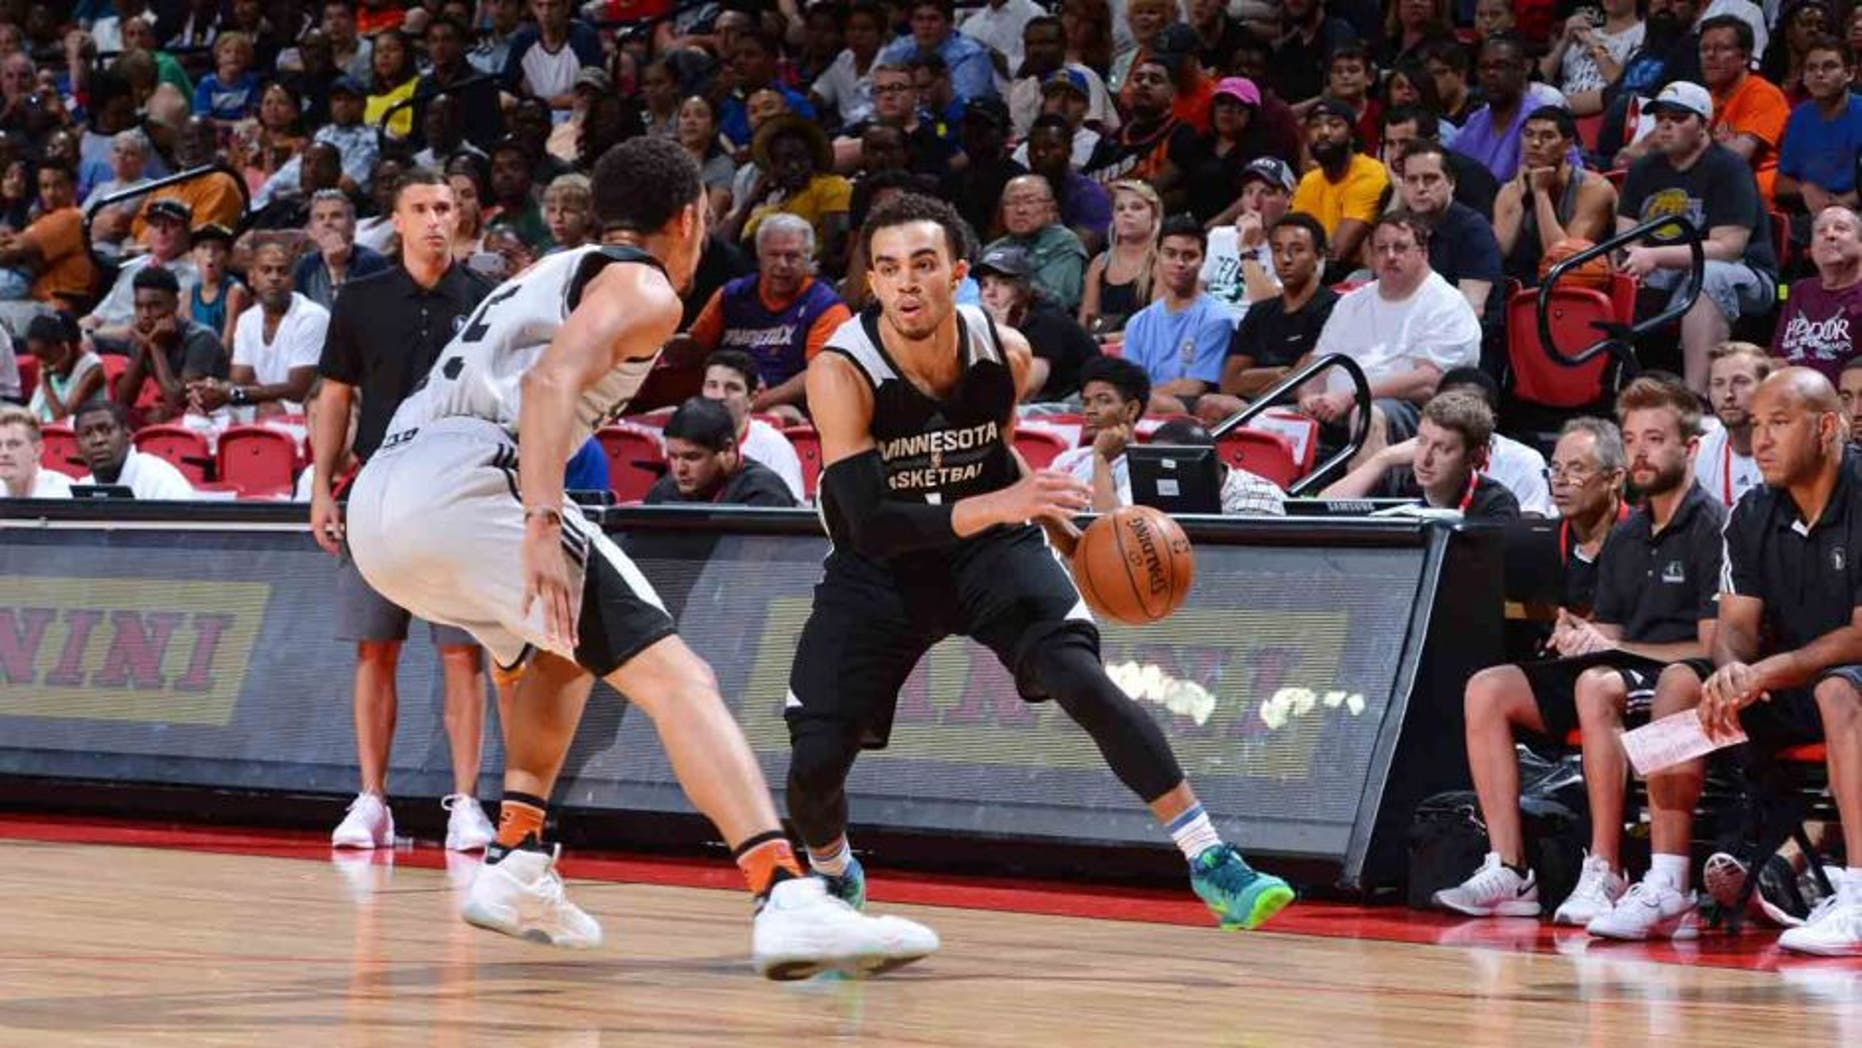 The Minnesota Timberwolves' Tyus Jones handles the ball against the Phoenix Suns during a 2016 NBA Las Vegas Summer League tournament semifinal game July 17, 2016, at the Thomas & Mack Center in Las Vegas.